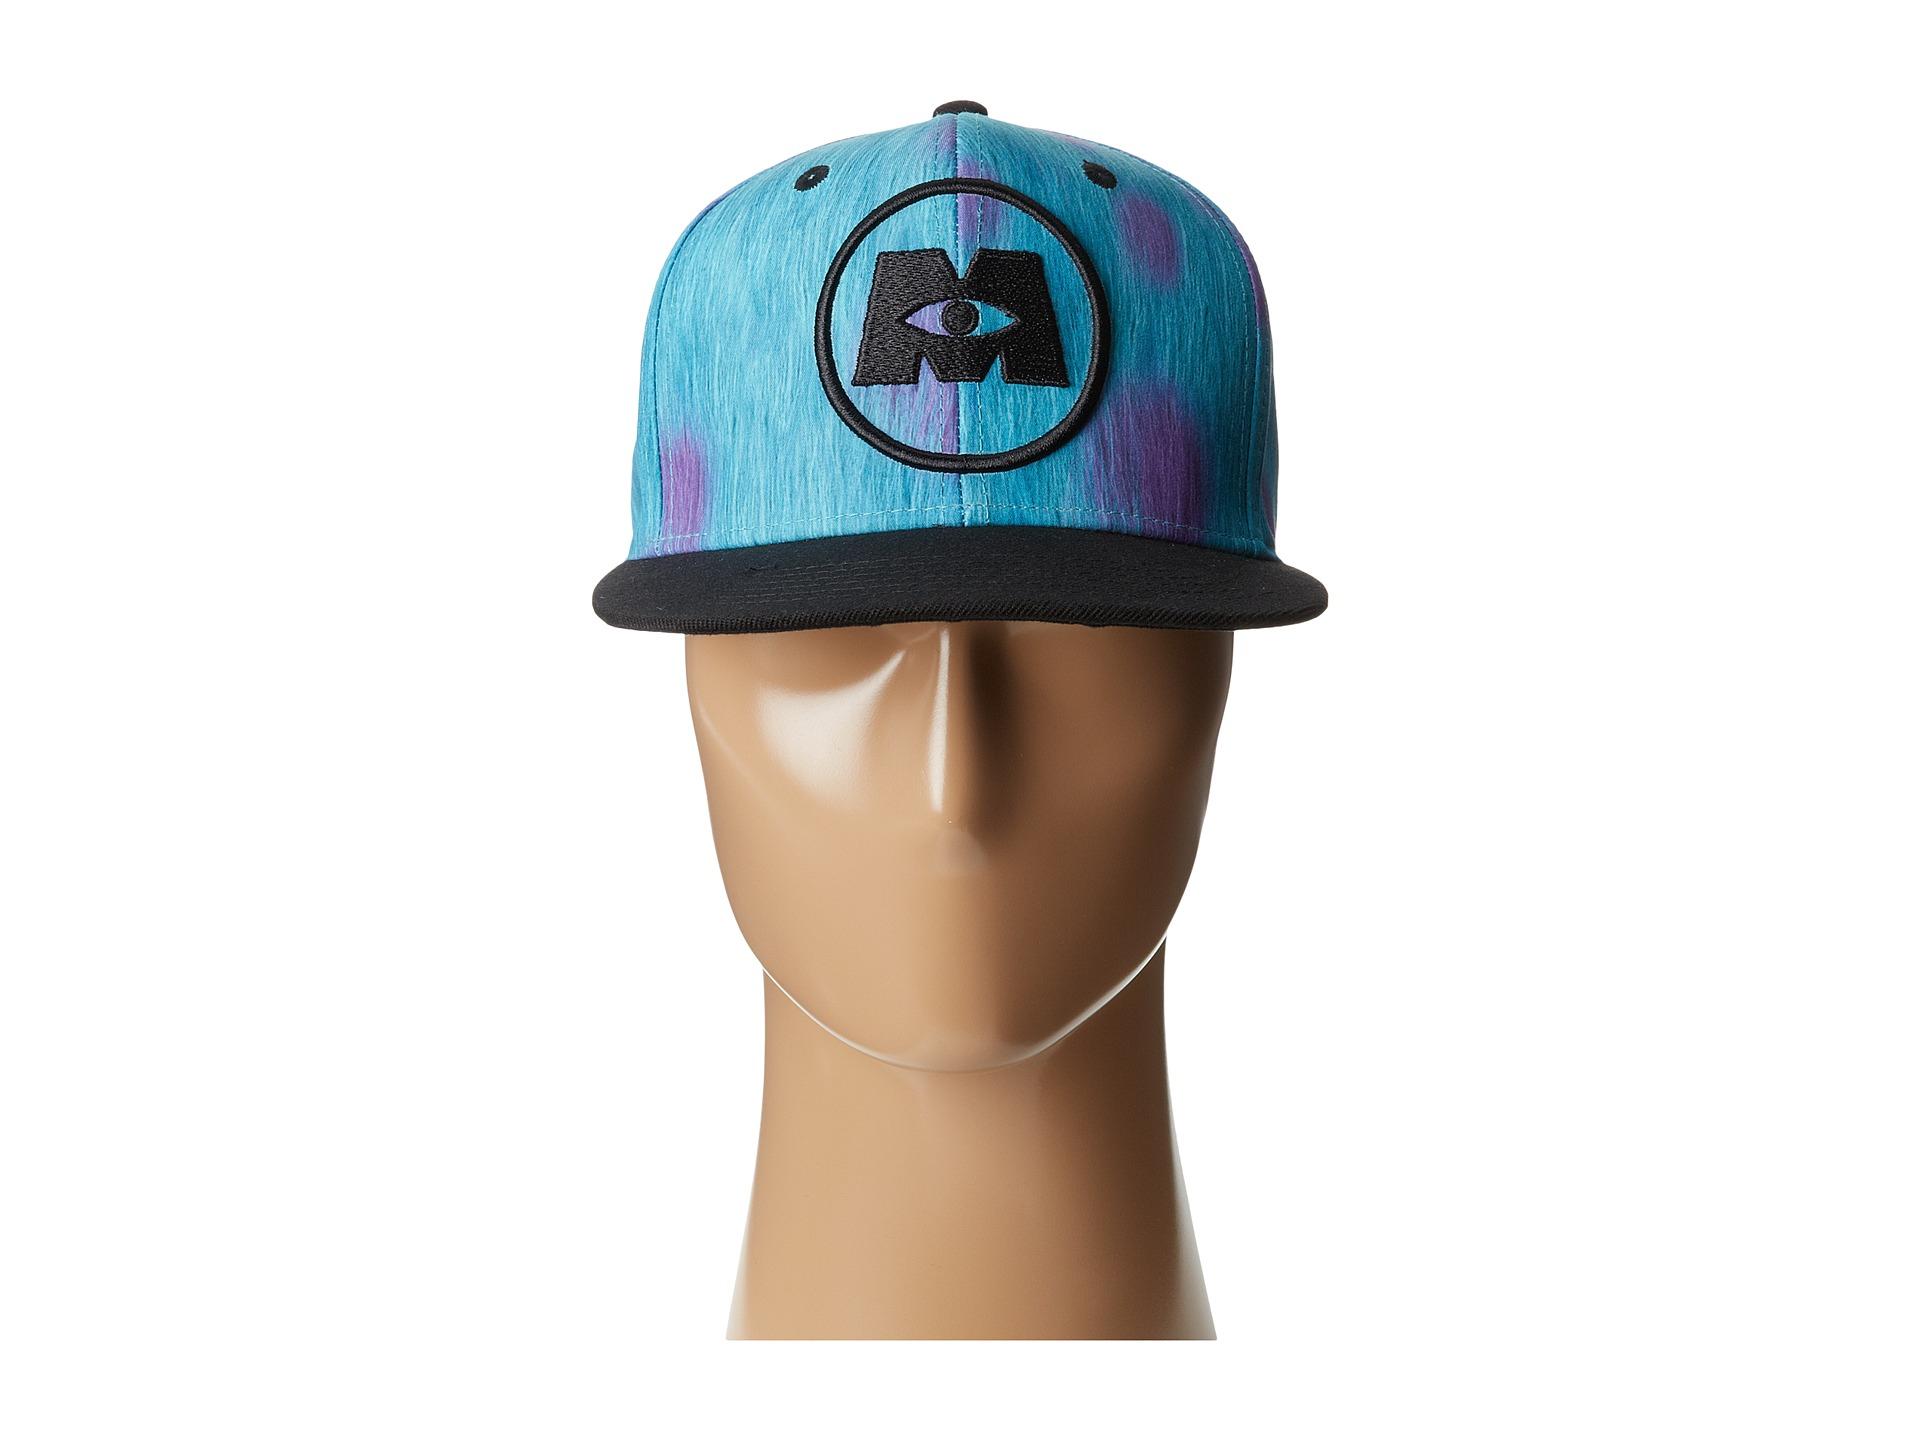 5a345fbde9a1d Lyst - Neff Monster Cap in Blue for Men